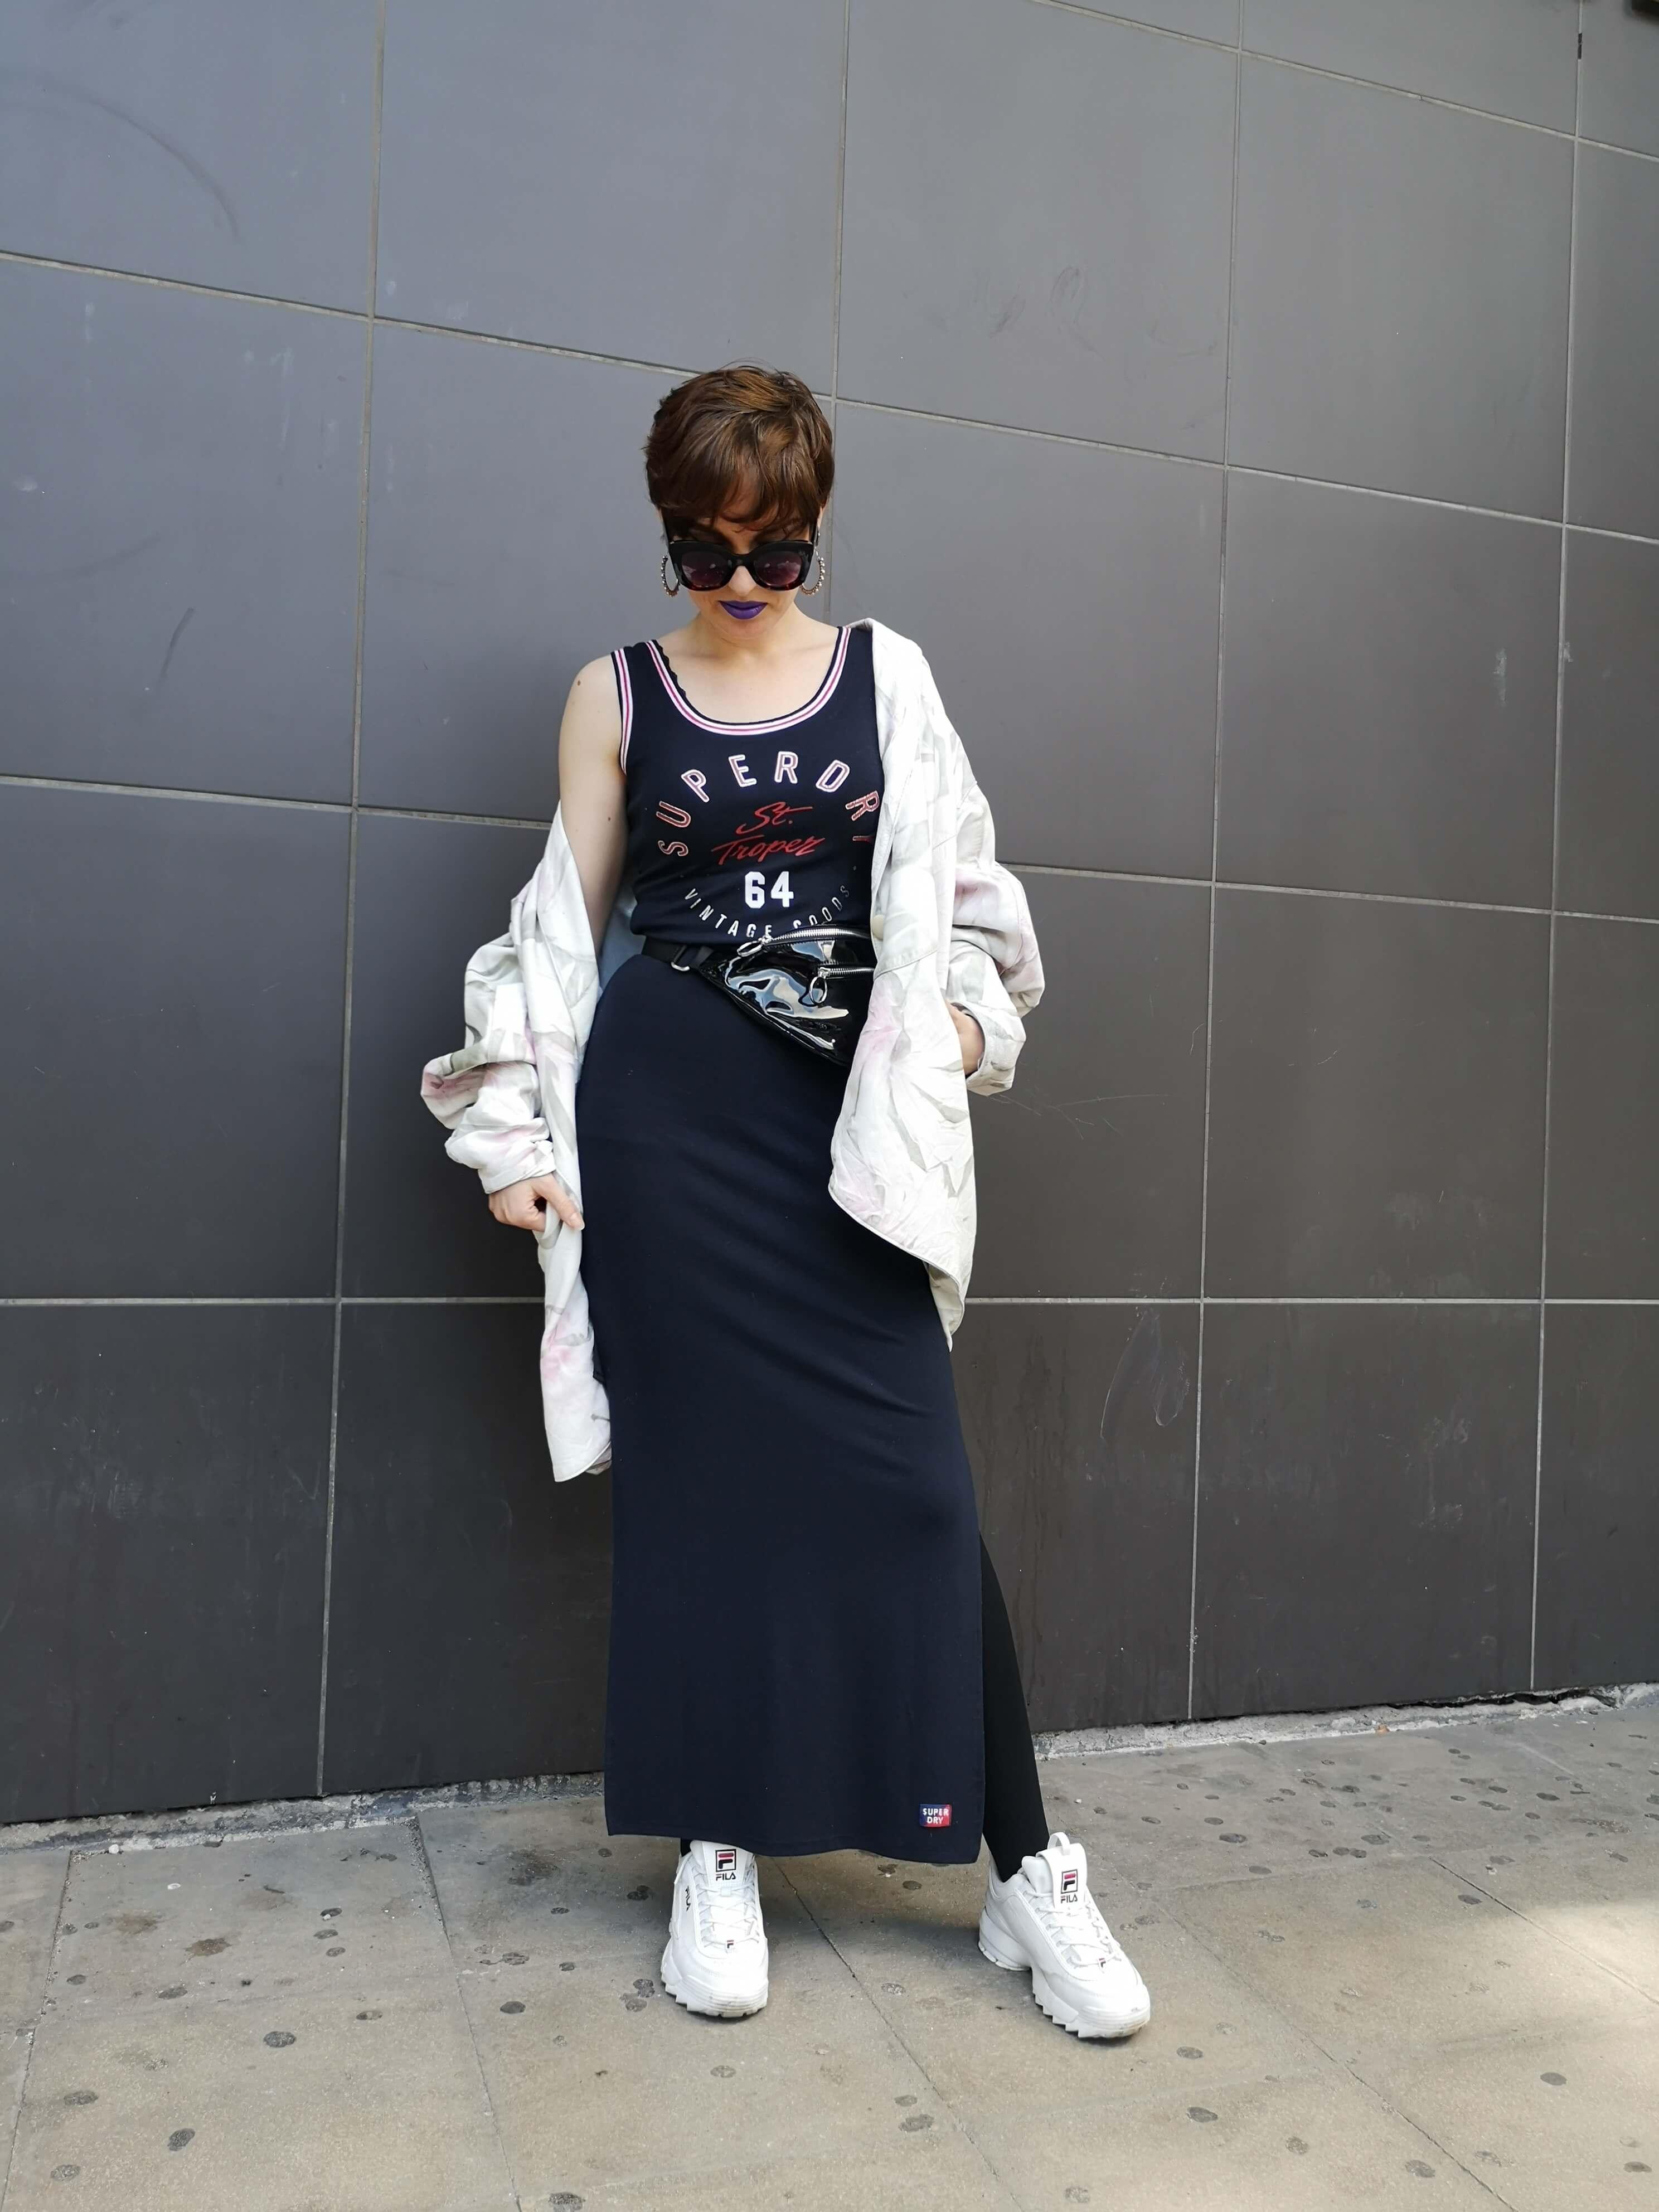 [MODNI KOLEGIJ] Sportska elegancija na budućoj modnoj dizajnerici izgleda neodoljivo!